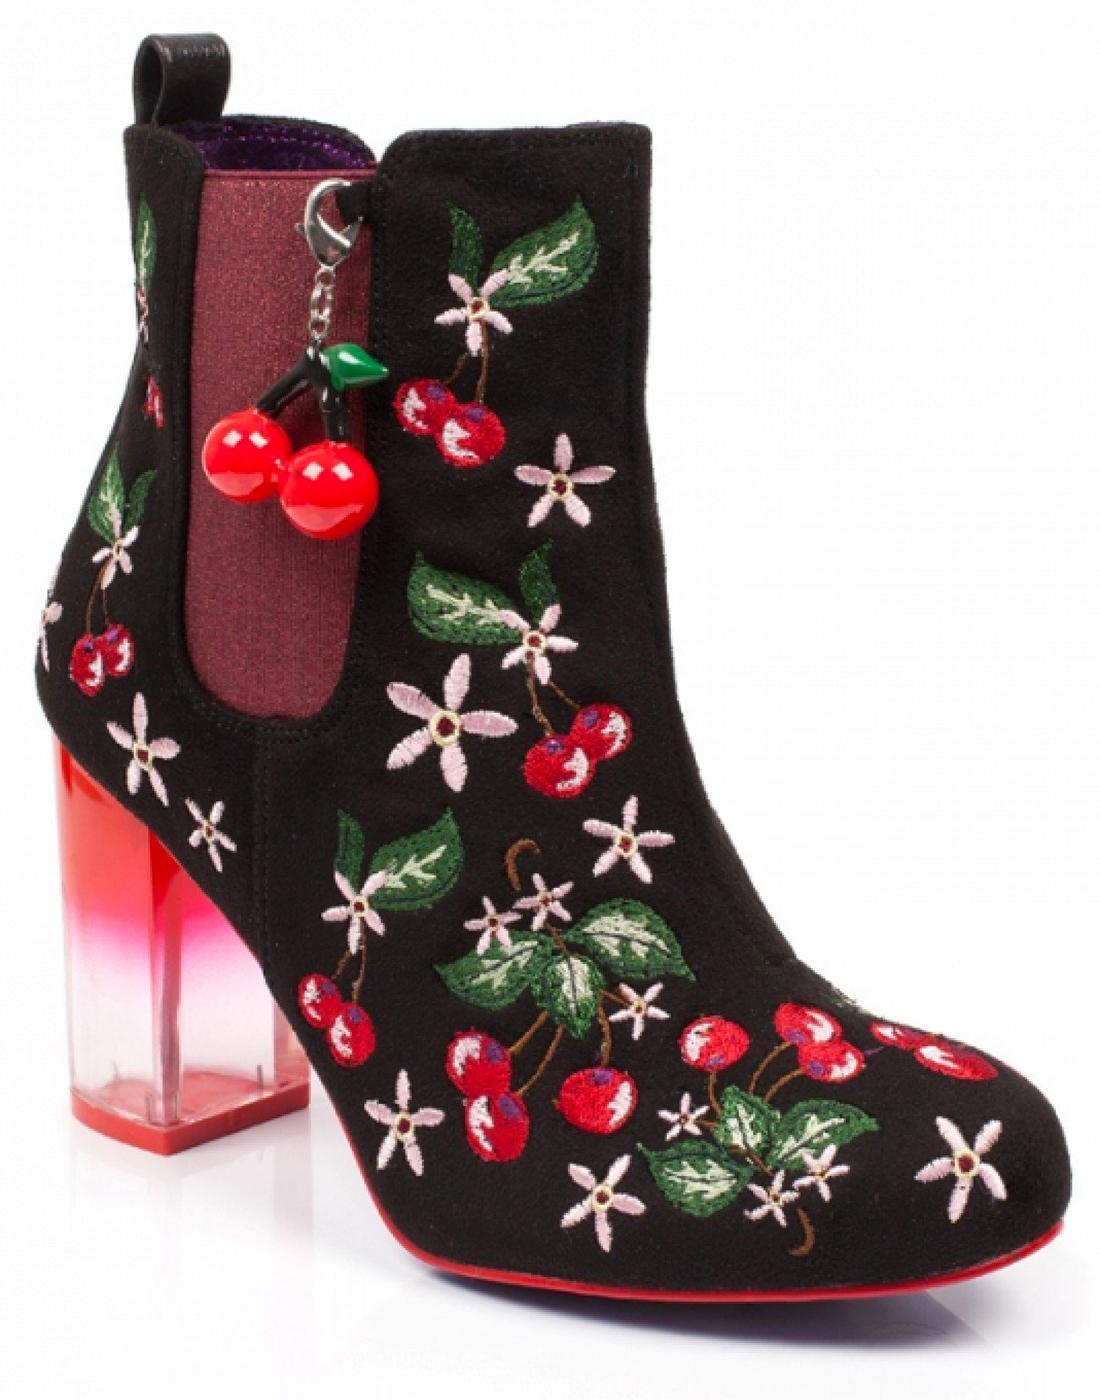 Cherry Nice POETIC LICENCE High Heel Boots - Black